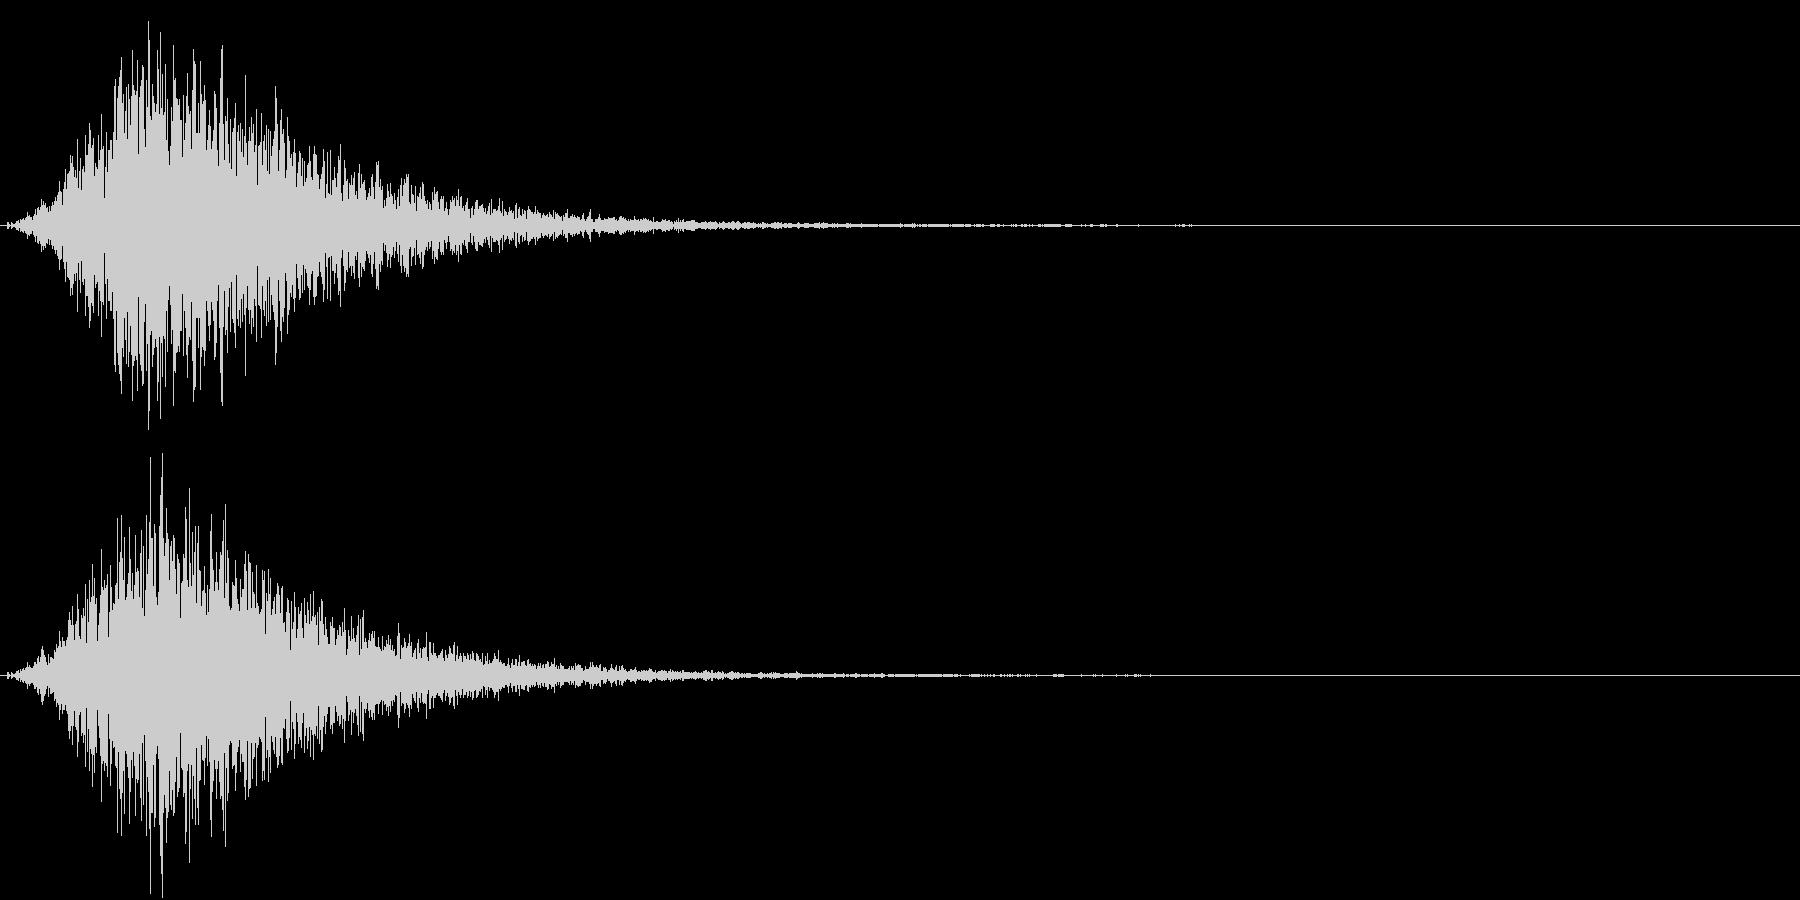 Battle 戦闘エフェクト音 1の未再生の波形